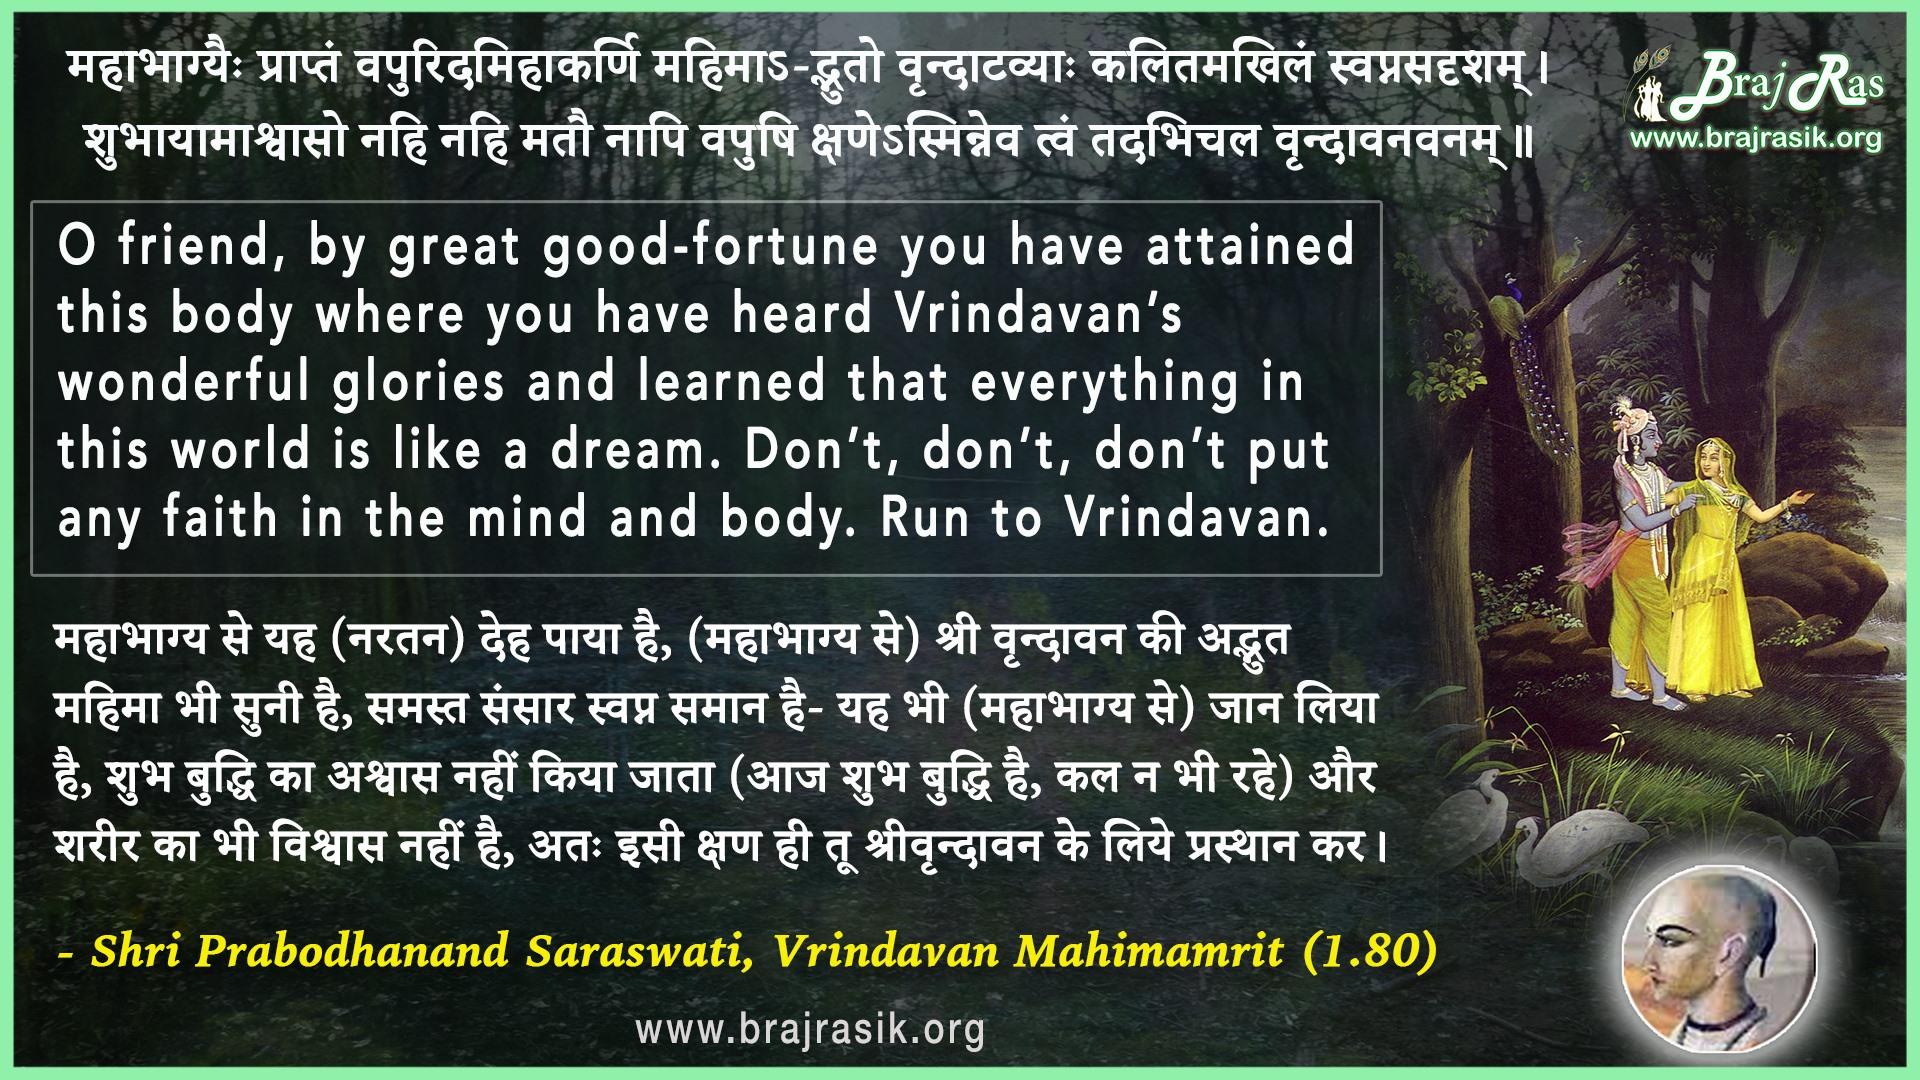 Mahaabhaagyaih Praaptam Vapuridamihaakarni Mahima - Shri Prabodhananda Sarasvati, Vrindavan Mahimamrit (1.80)